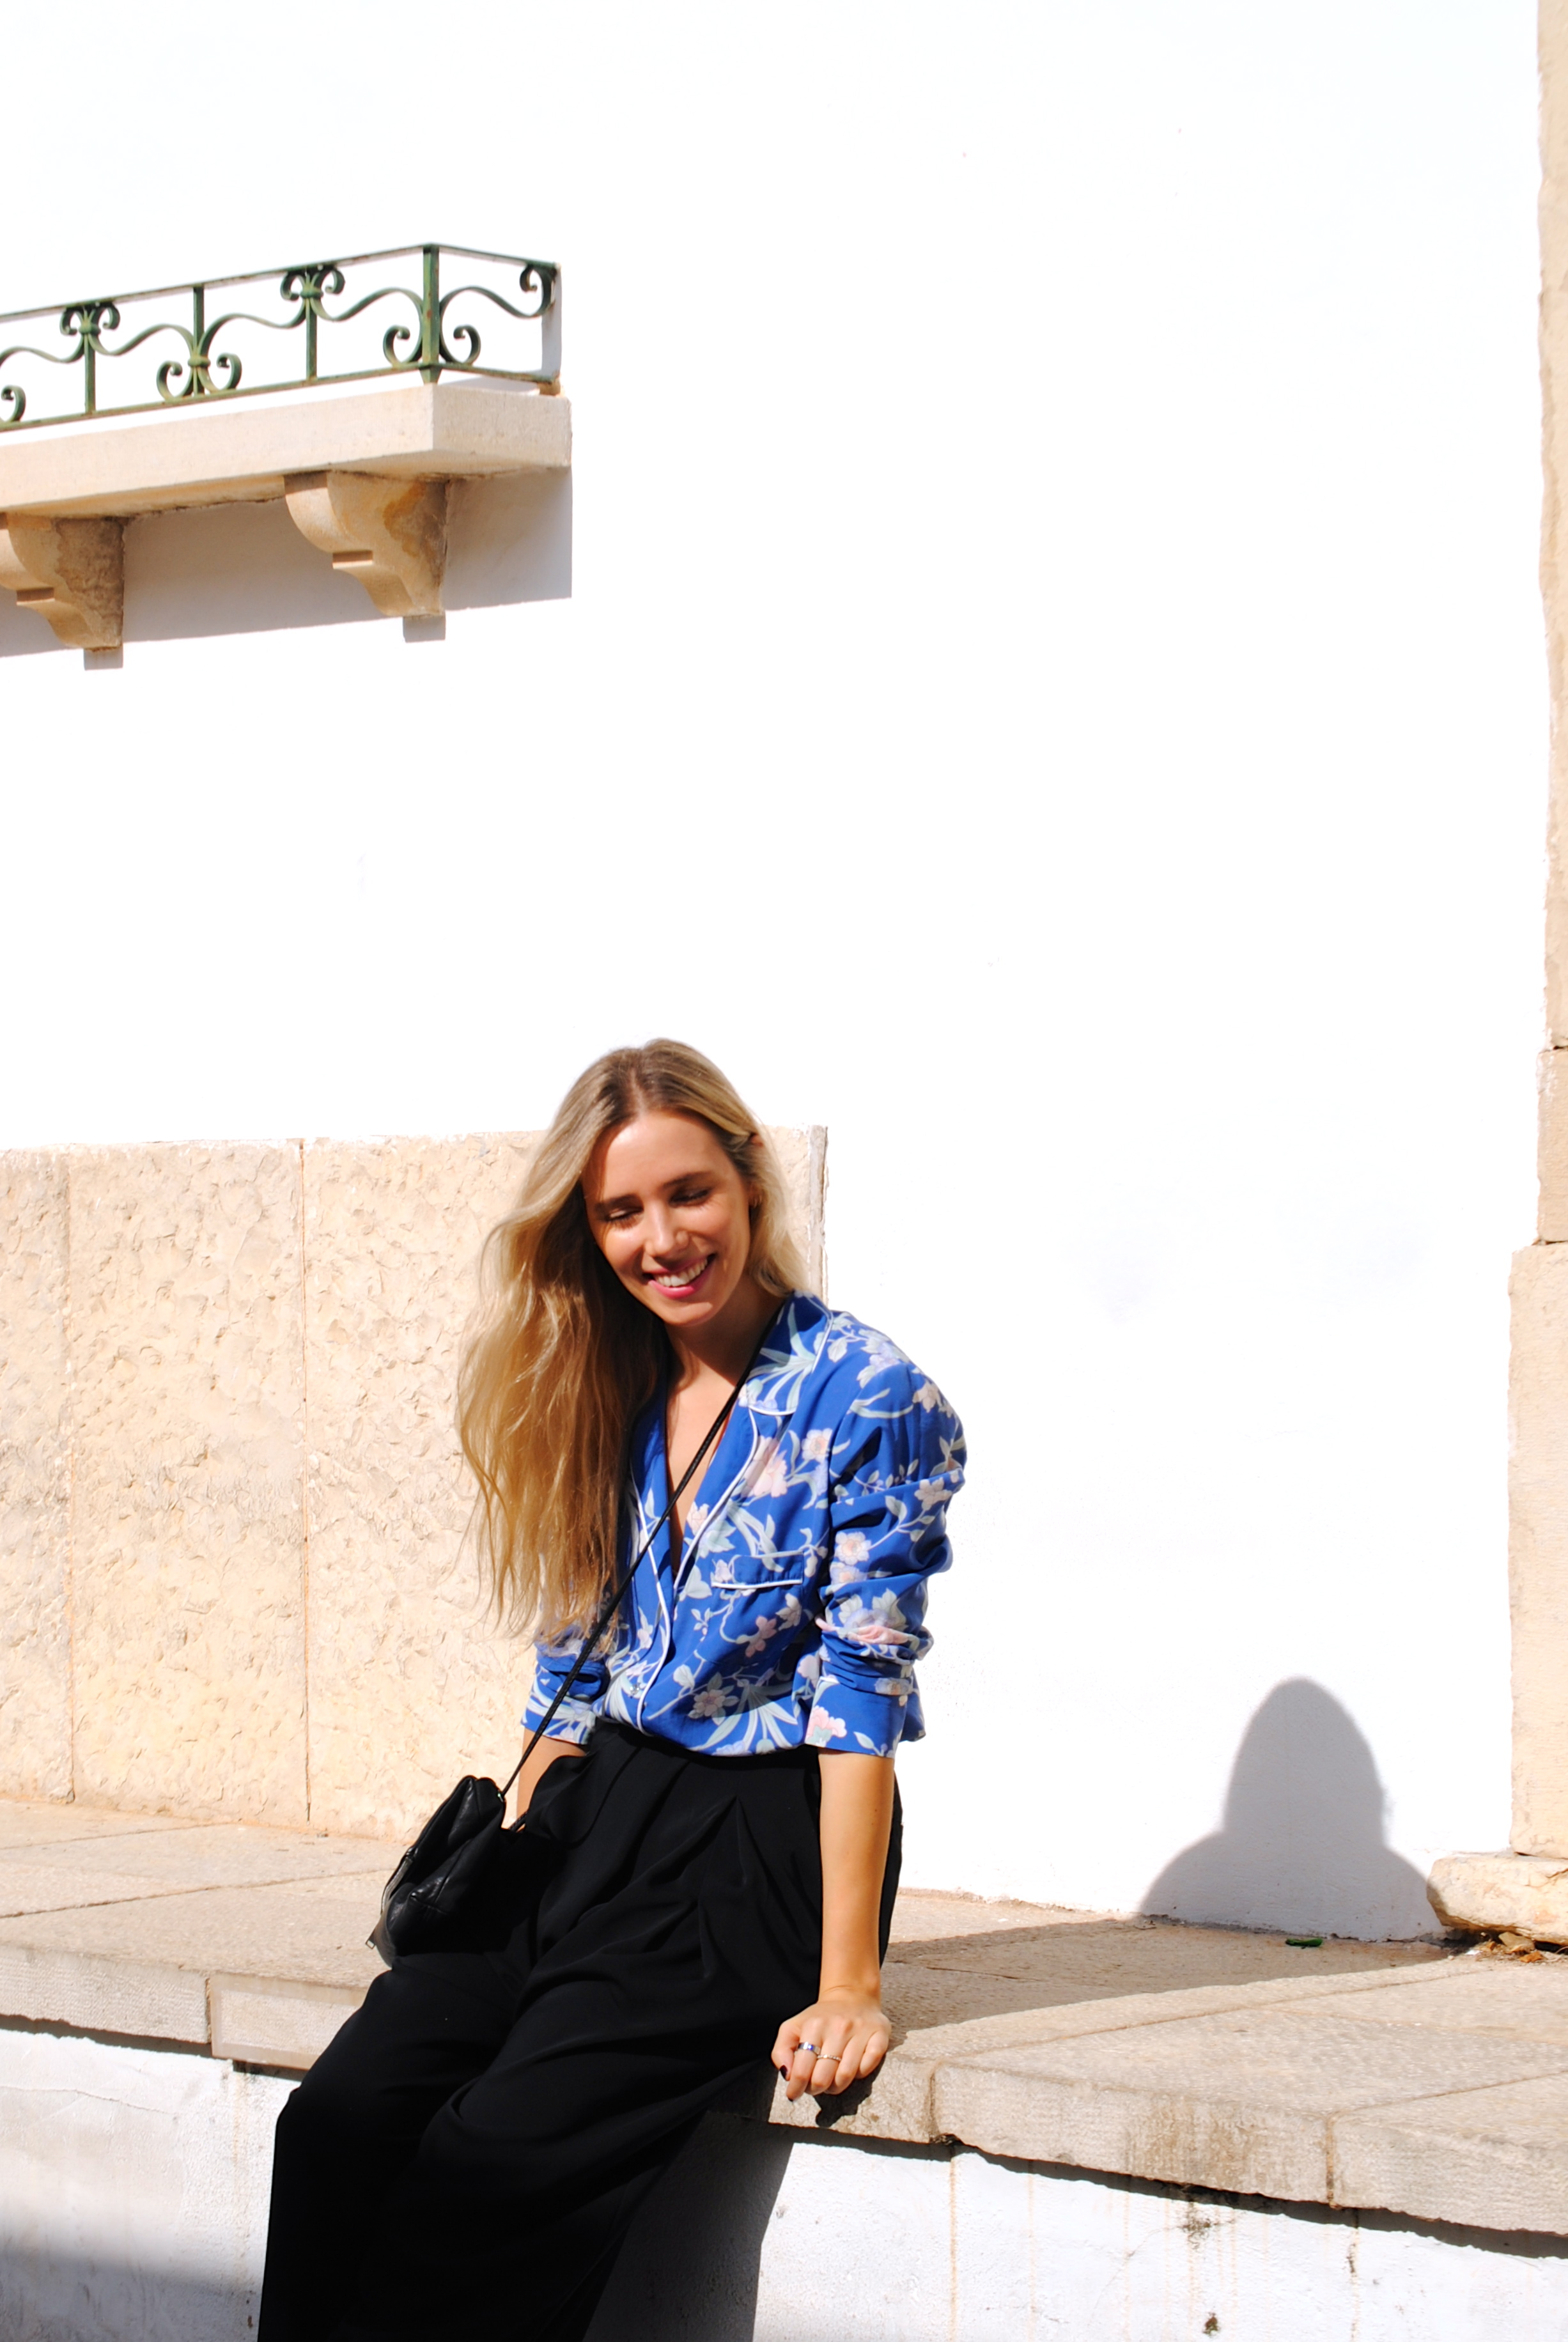 Camisa: Women Secret; Pantalones: H&M; Sandalias: Zara; Bolso: COS